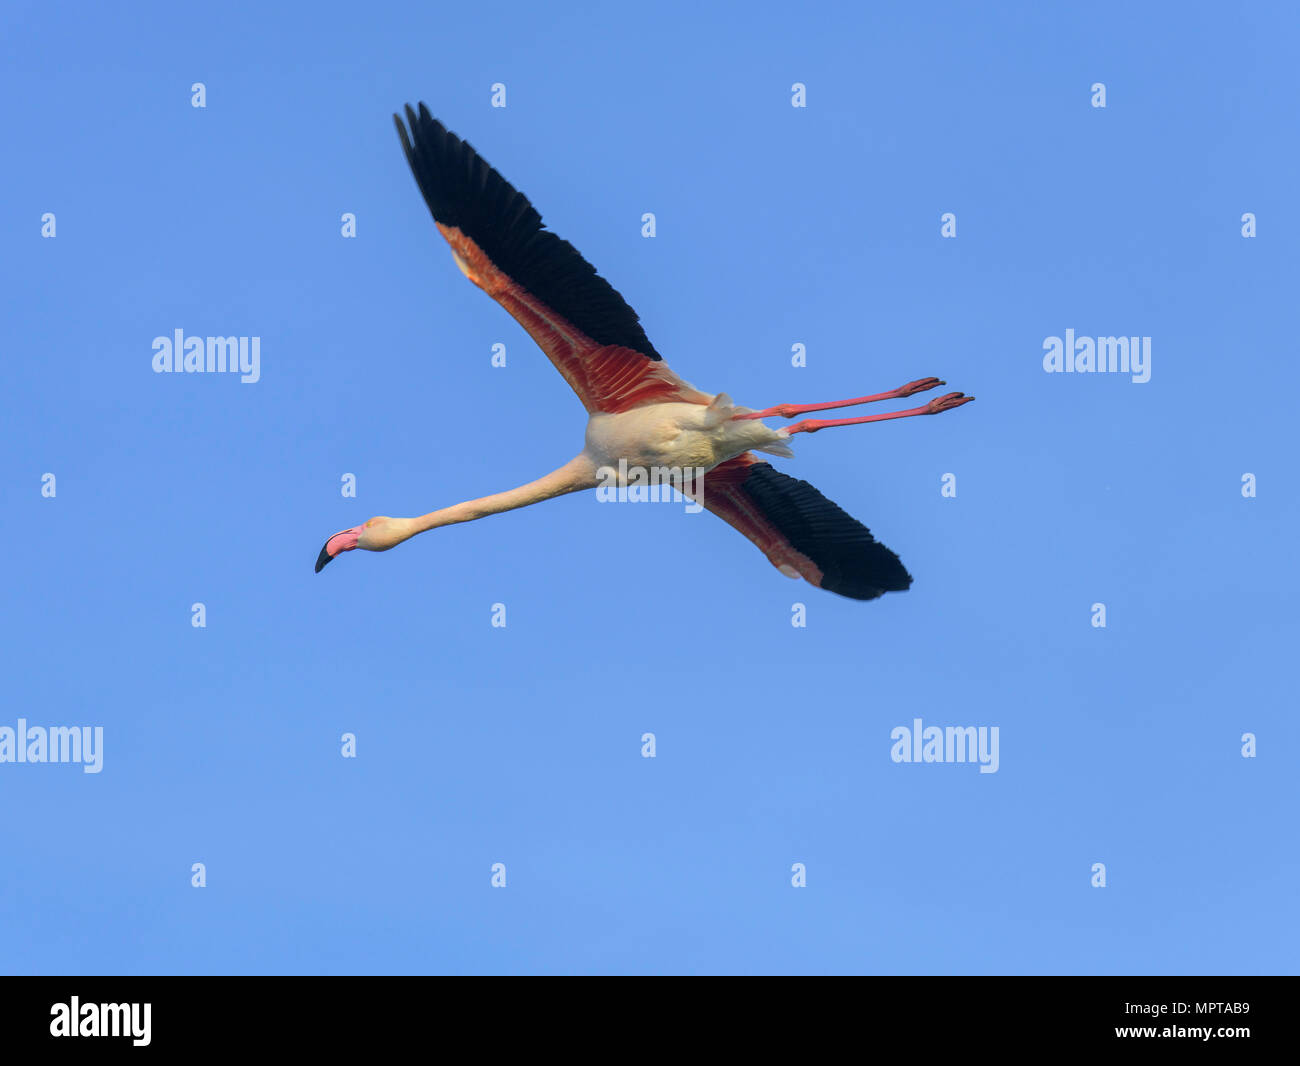 Greater flamingo (Phoenicopterus roseus), flying in blue sky, Comacchio, Emilia-Romagna, Italy - Stock Image